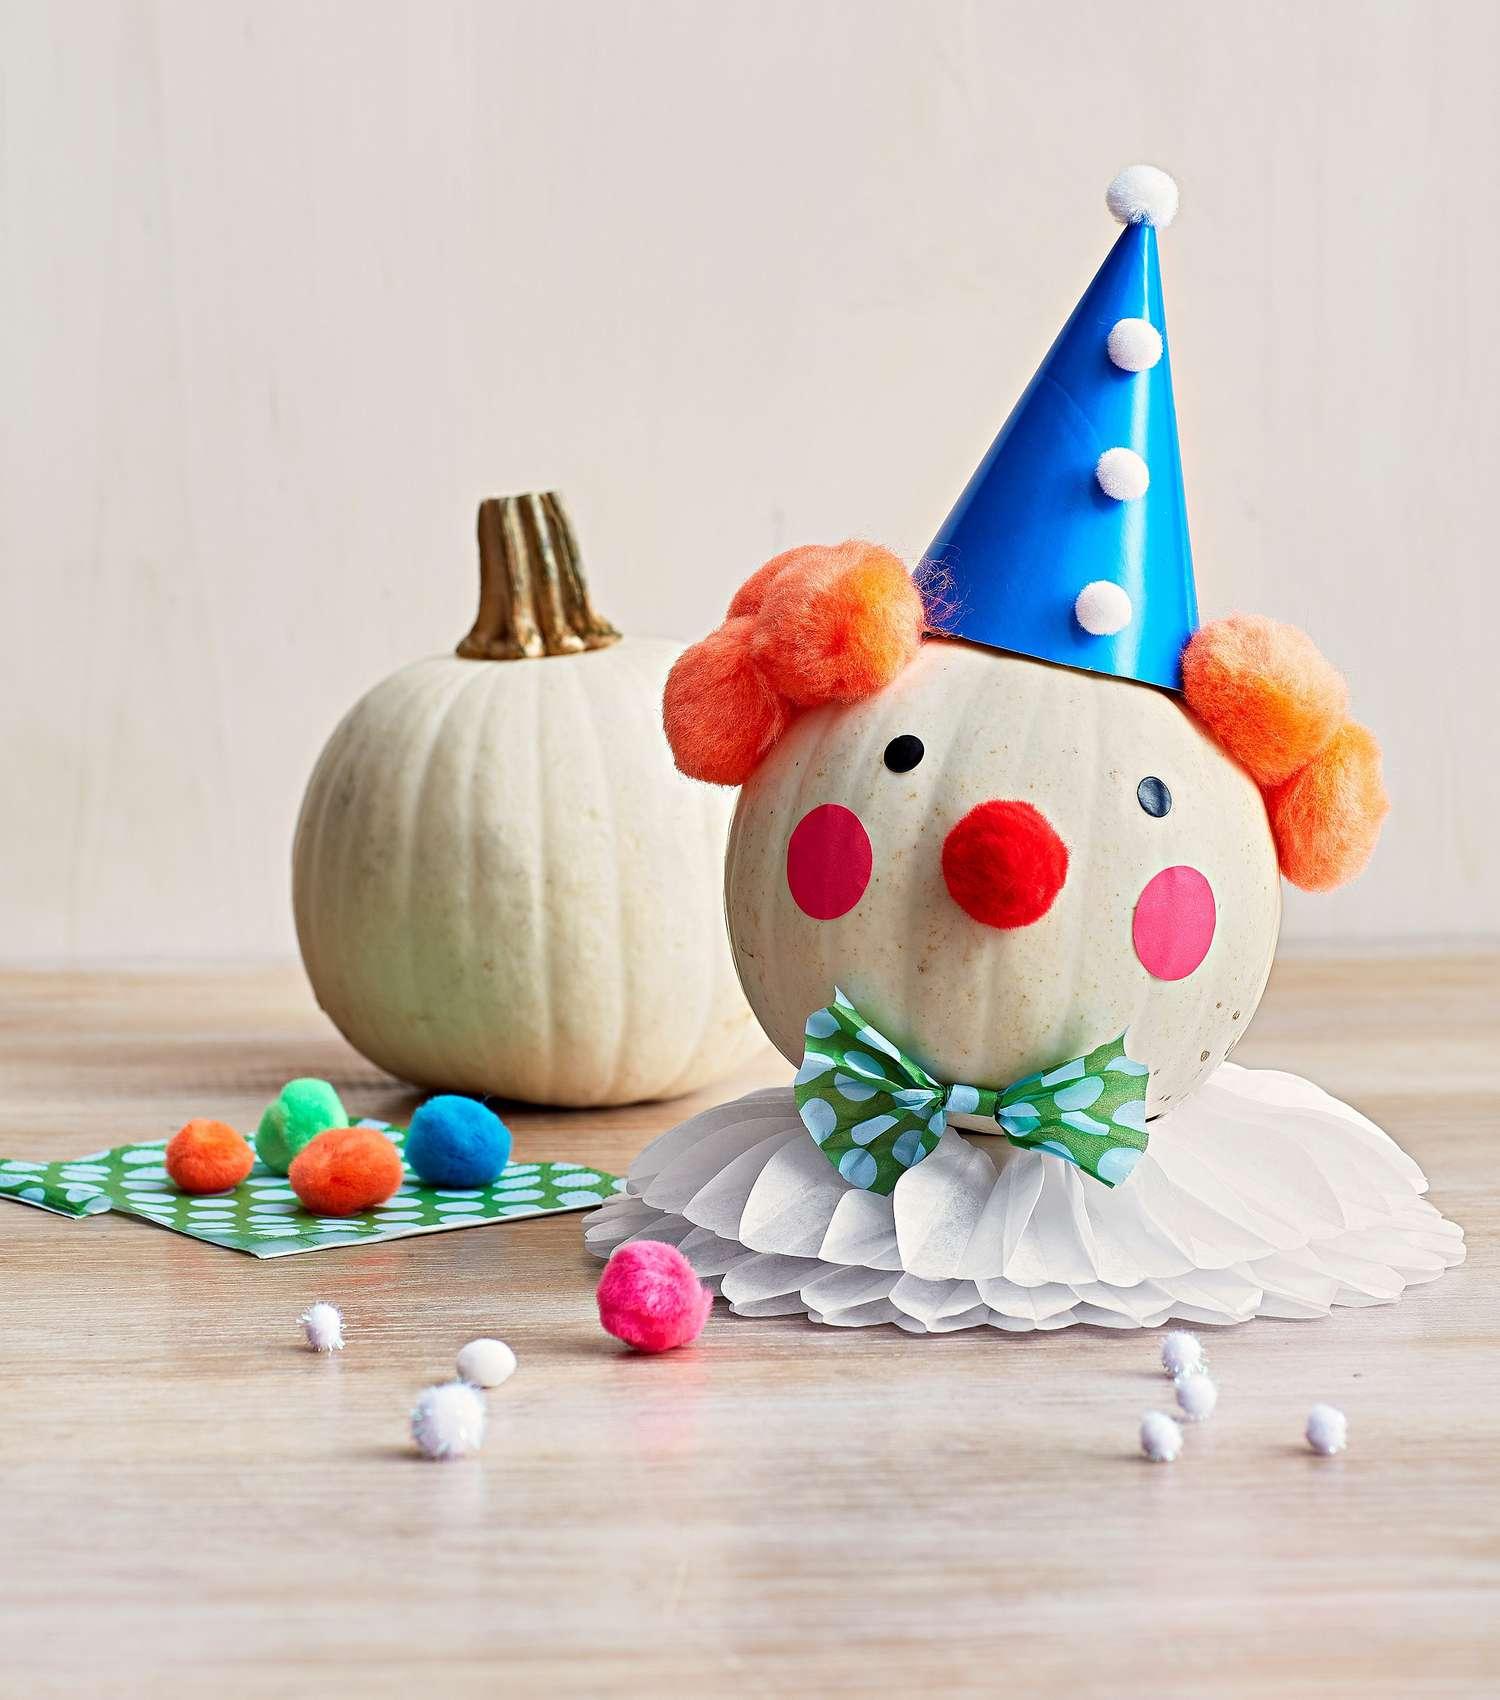 Easy No Carve Pumpkin Decorating Ideas For Kids